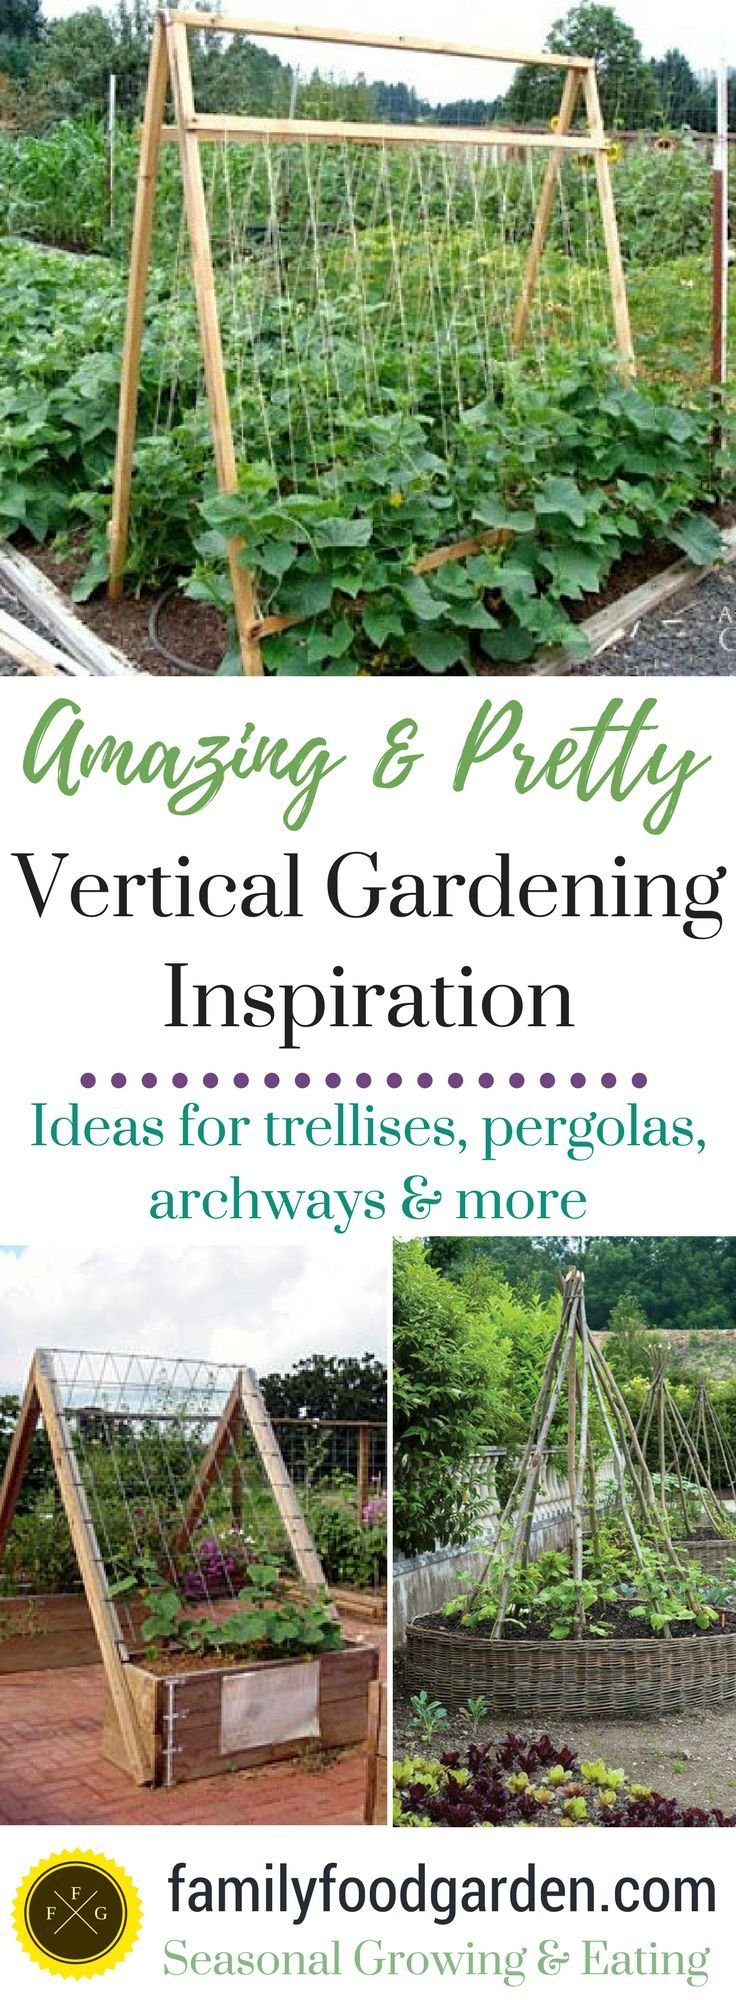 Vegetable gardening ideas - Amazing Vertical Gardening Ideas Vegetable